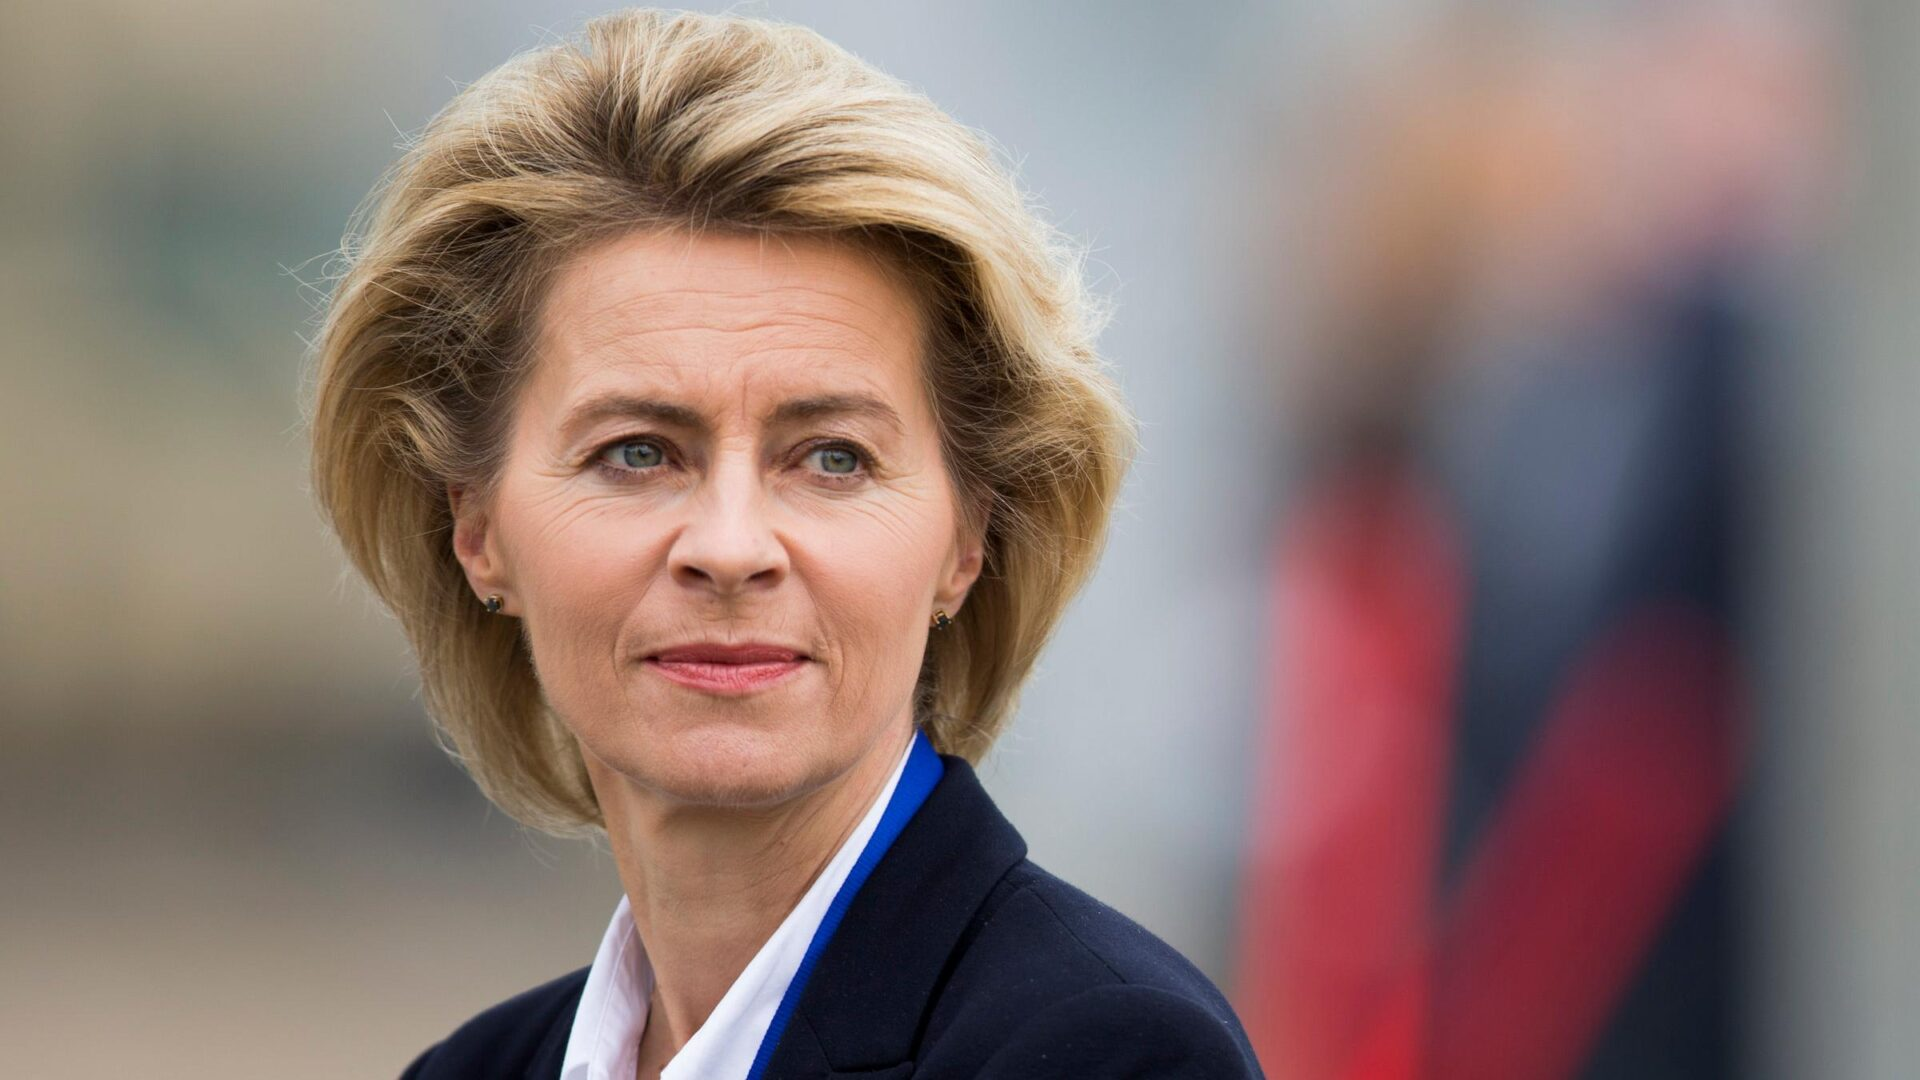 Ursula von der Leyen vrea noi reguli europene în materie